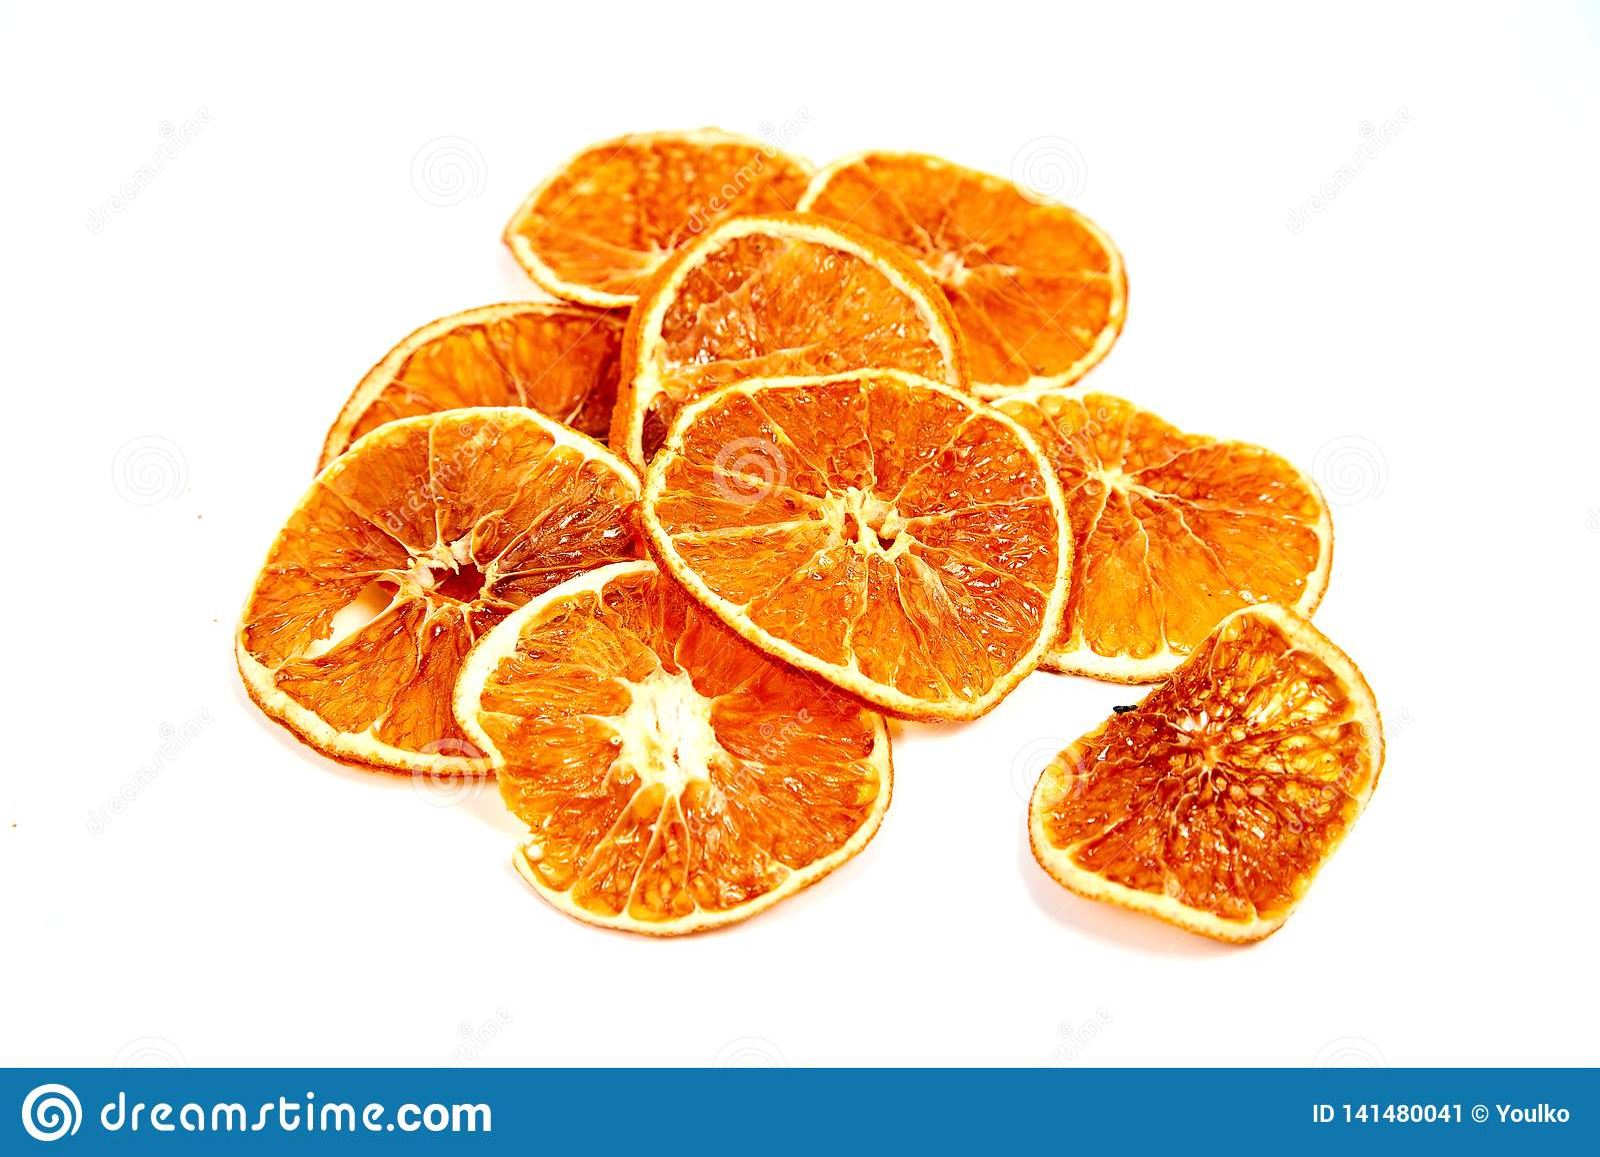 Cirklar av den torkade tangerin på en vit bakgrund